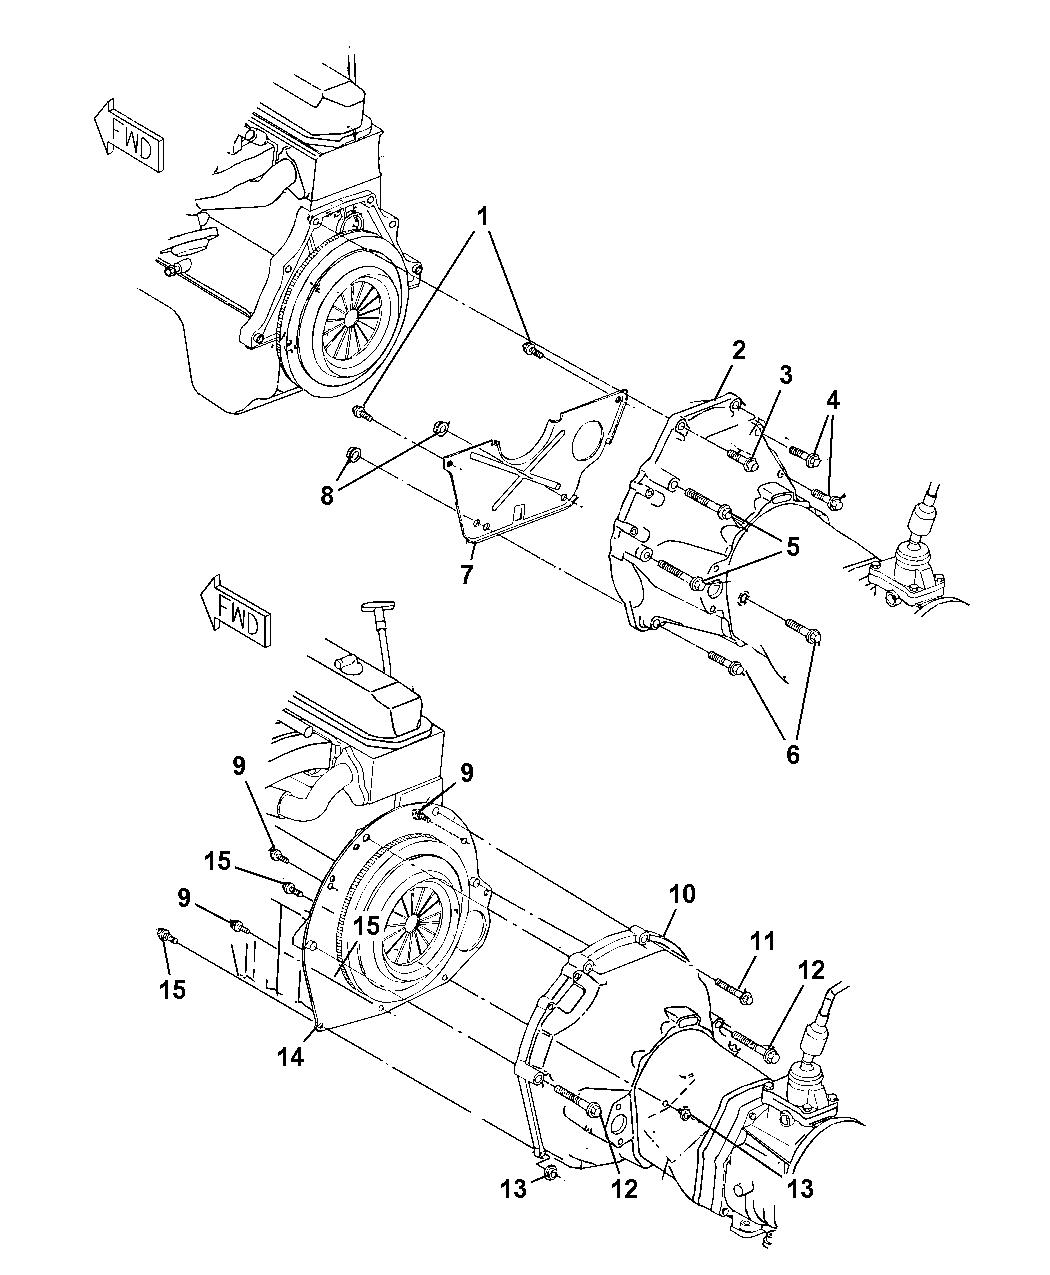 52107552 Genuine Jeep Housing Clutch 4 0l Engine Bellhousing Diagram 1998 Wrangler Pan